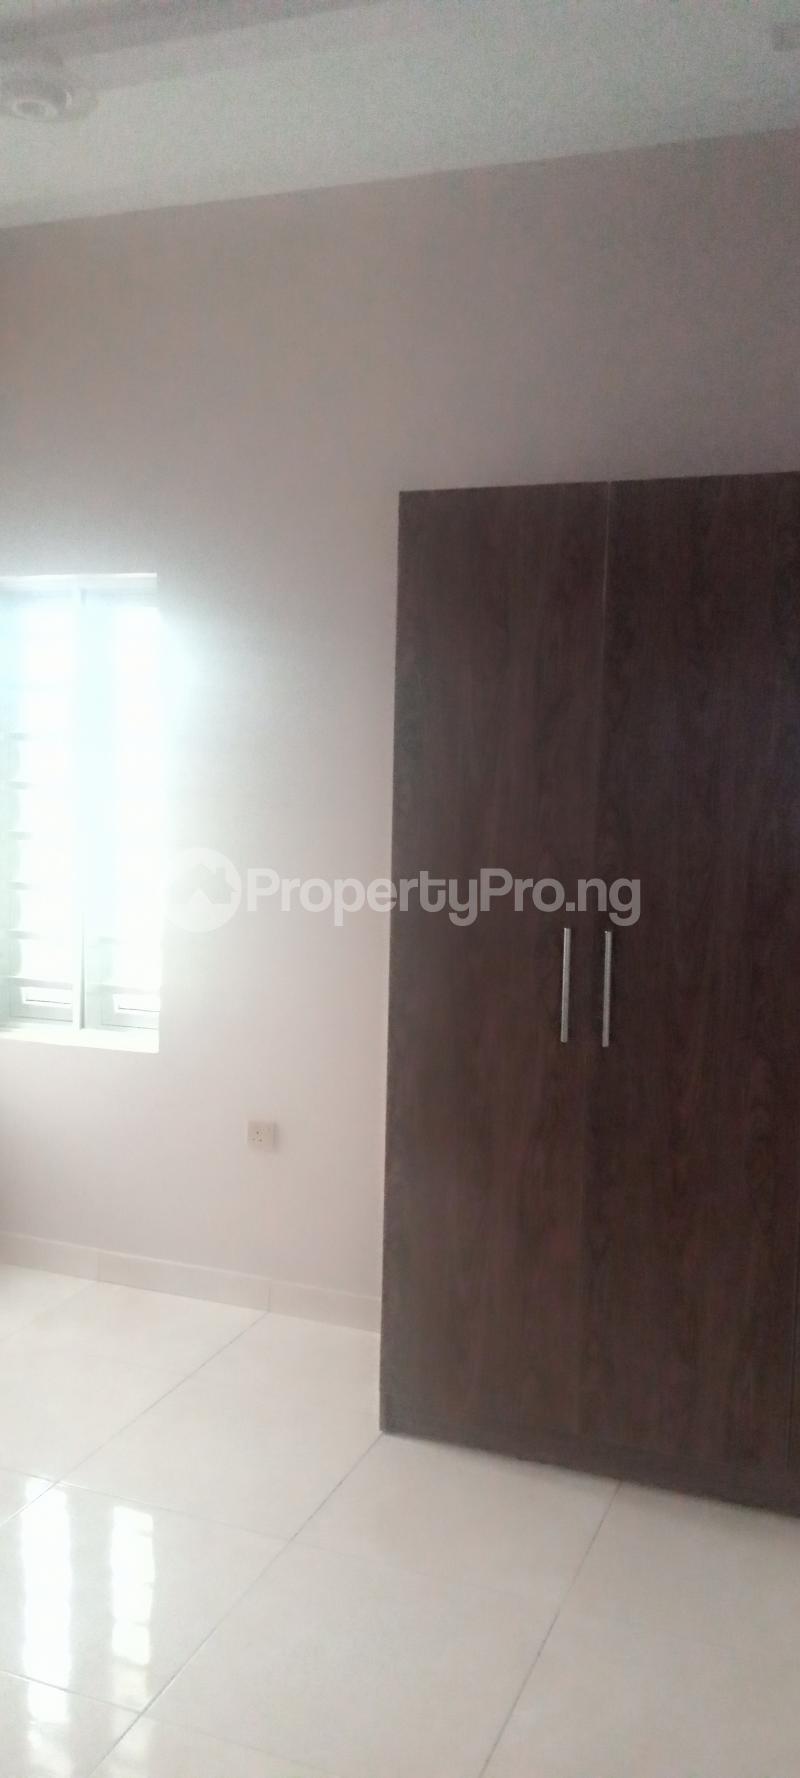 5 bedroom Detached Duplex House for sale Estate drive Omole phase 1 Ojodu Lagos - 9